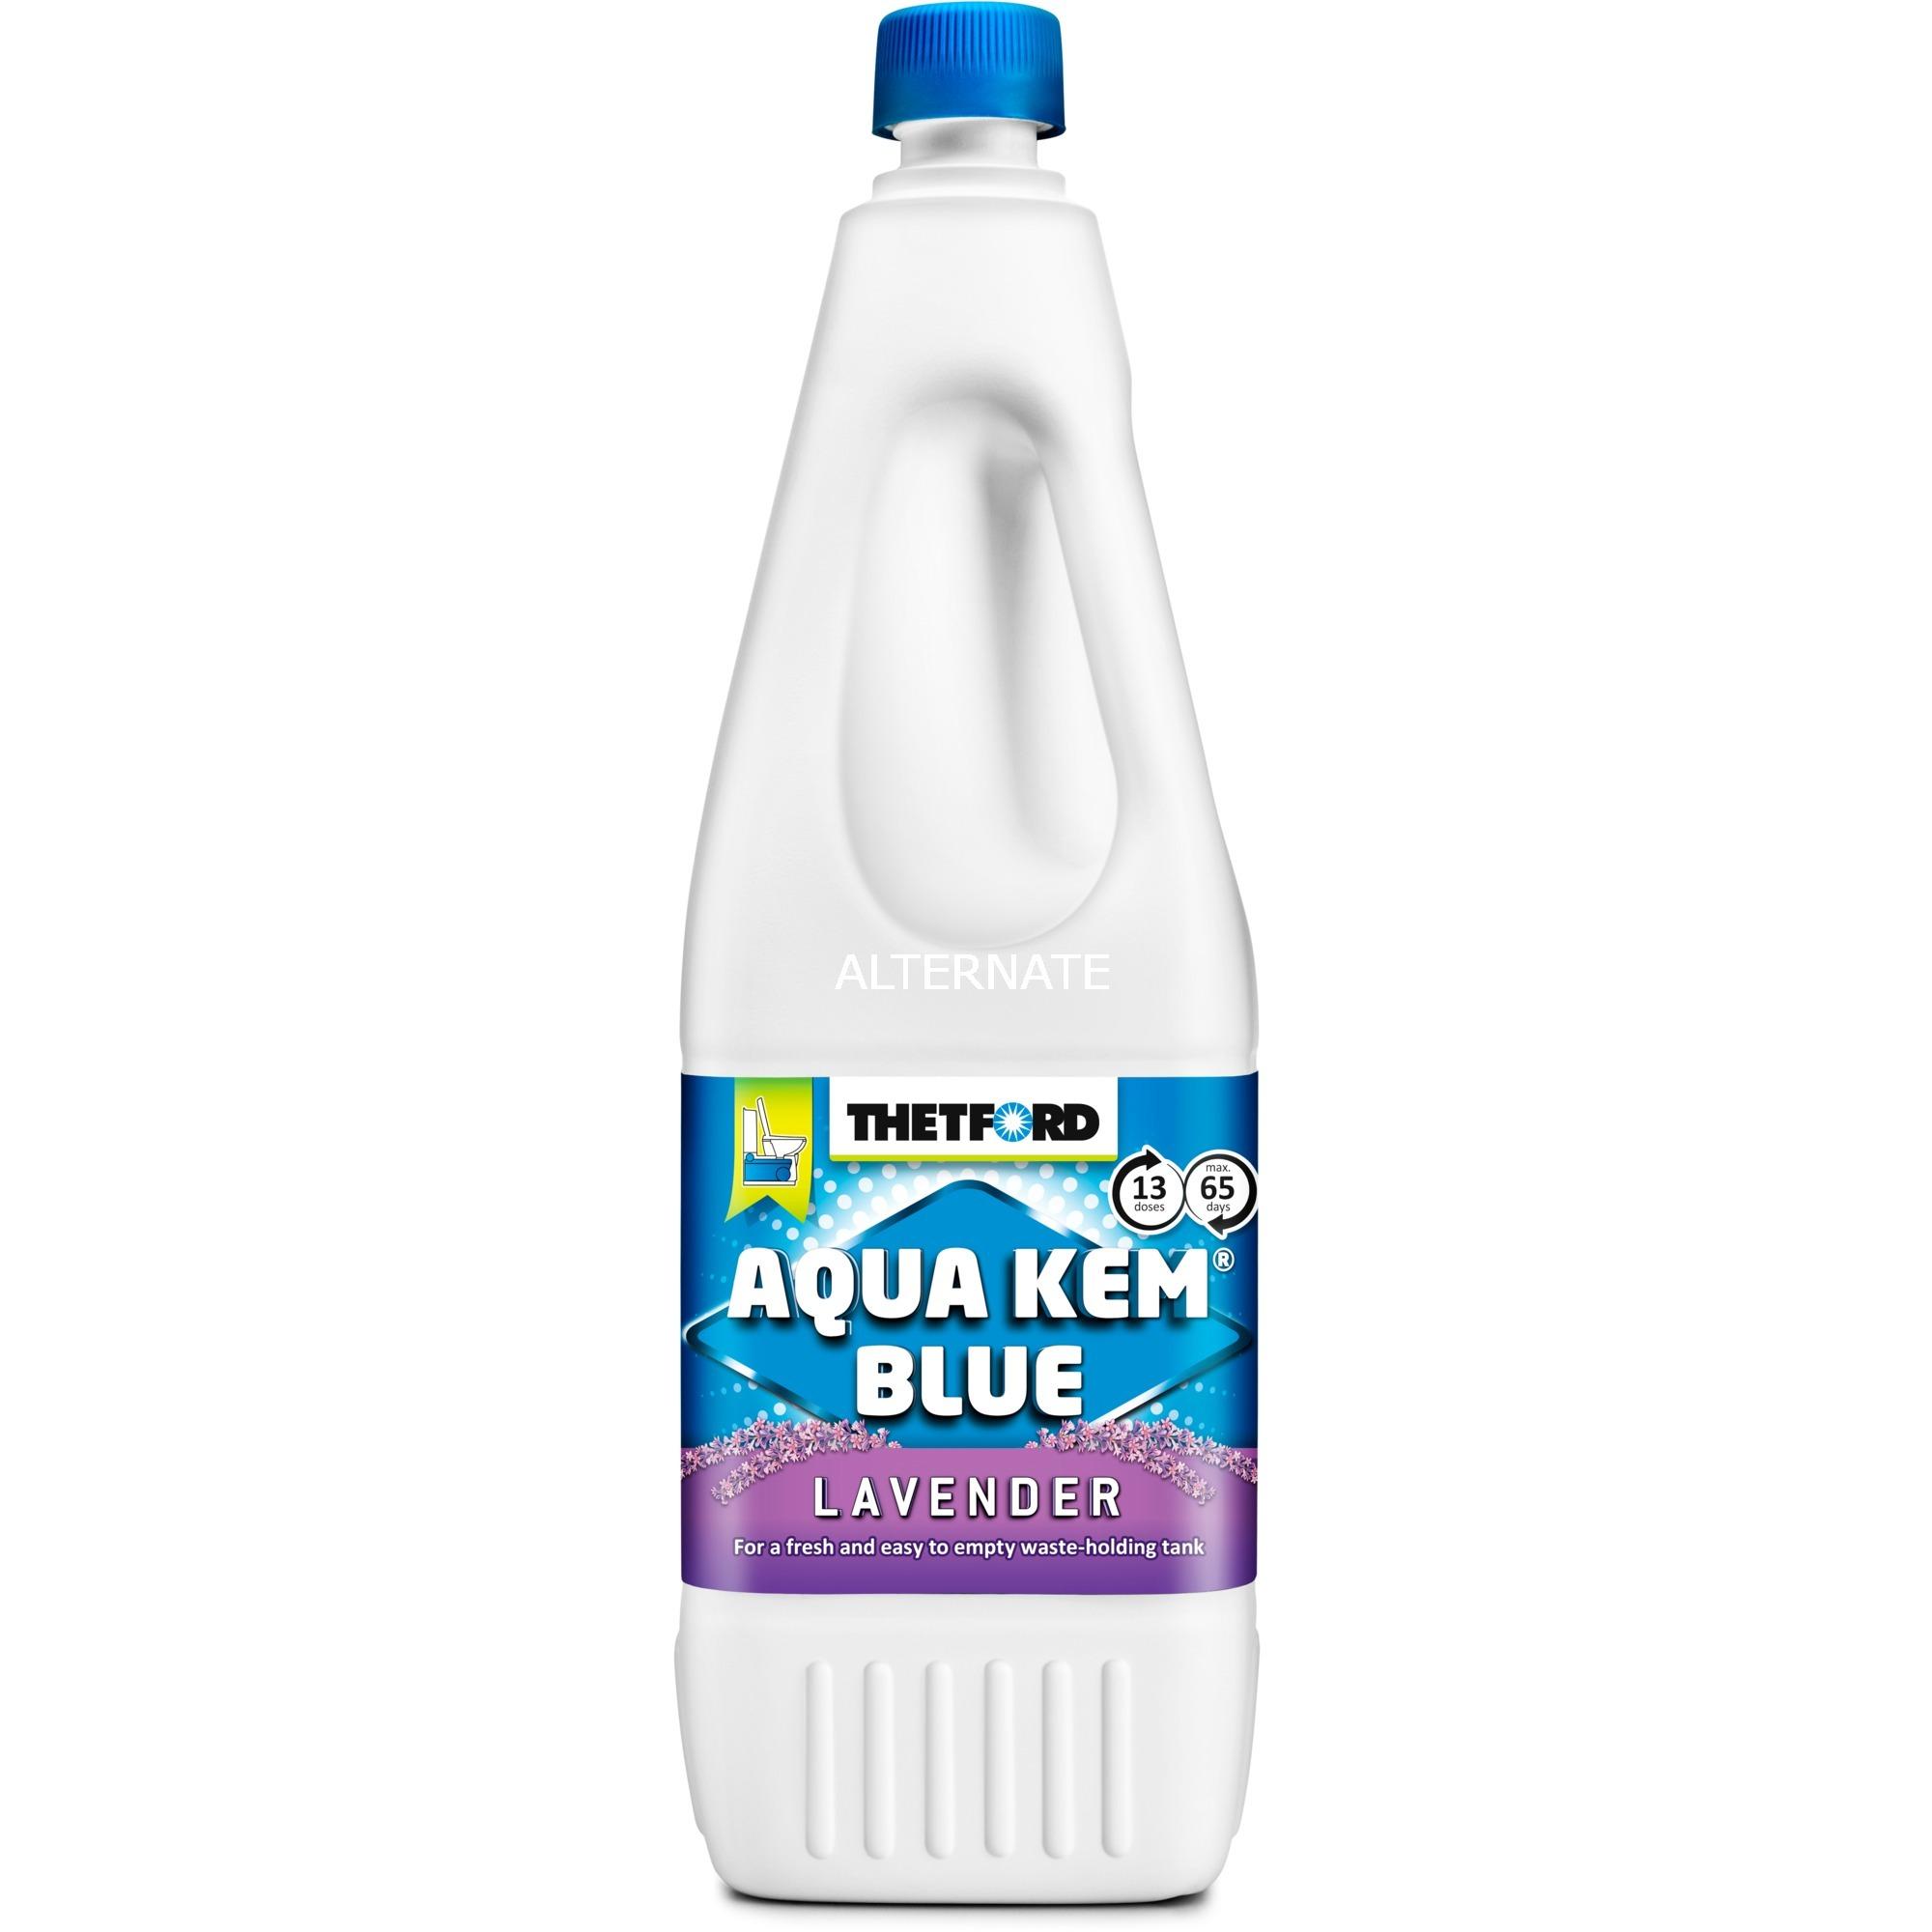 Aqua Kem Blue Lavender, Aditivo sanitario